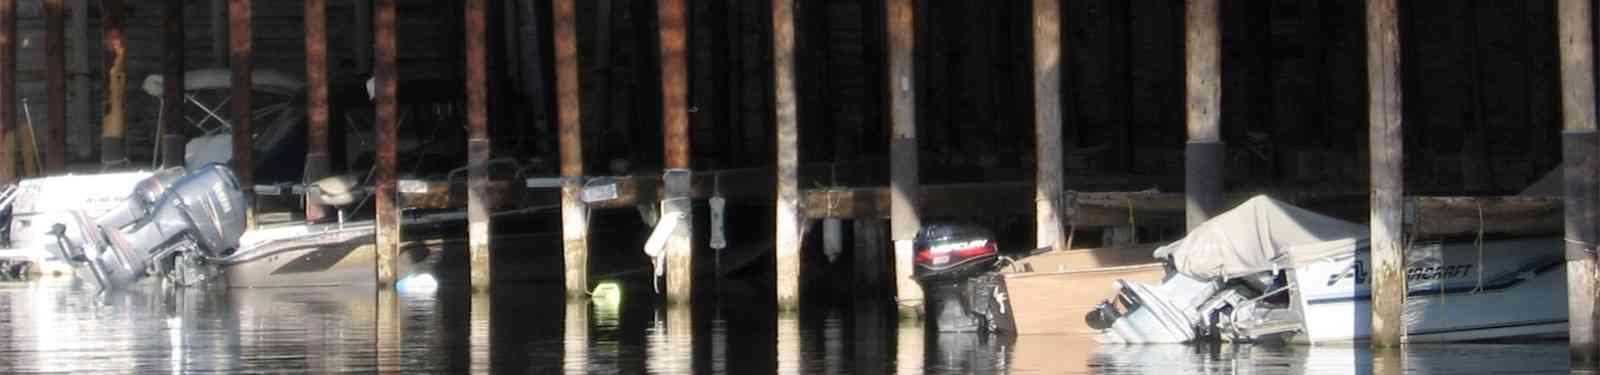 harbor-boat2